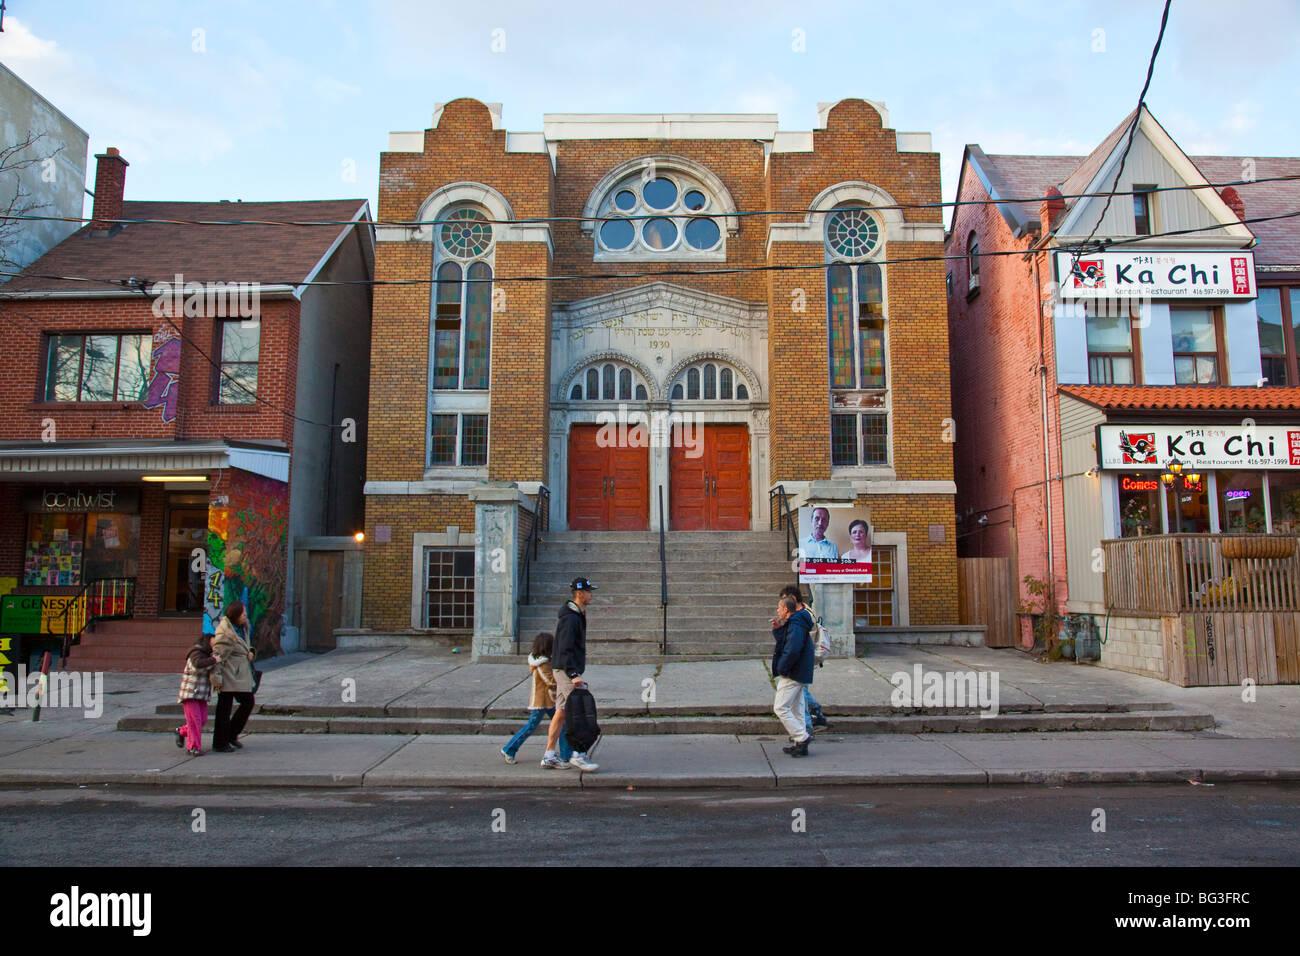 Anshei Minsk Synagogue inDowntown Toronto Canada - Stock Image